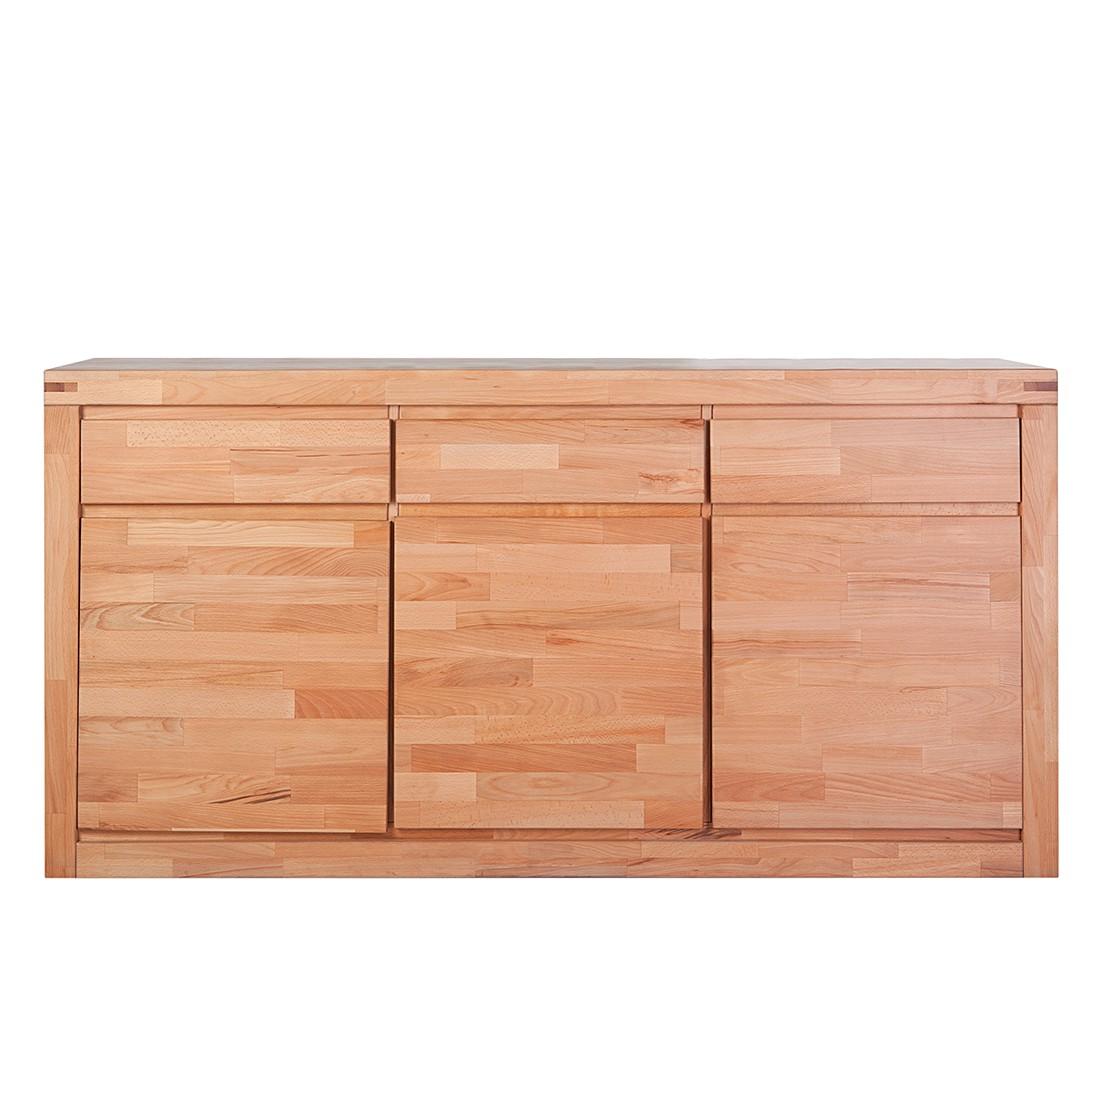 sideboard pia i wildeiche massiv ge lt ars natura m bel preiswert online kaufen. Black Bedroom Furniture Sets. Home Design Ideas